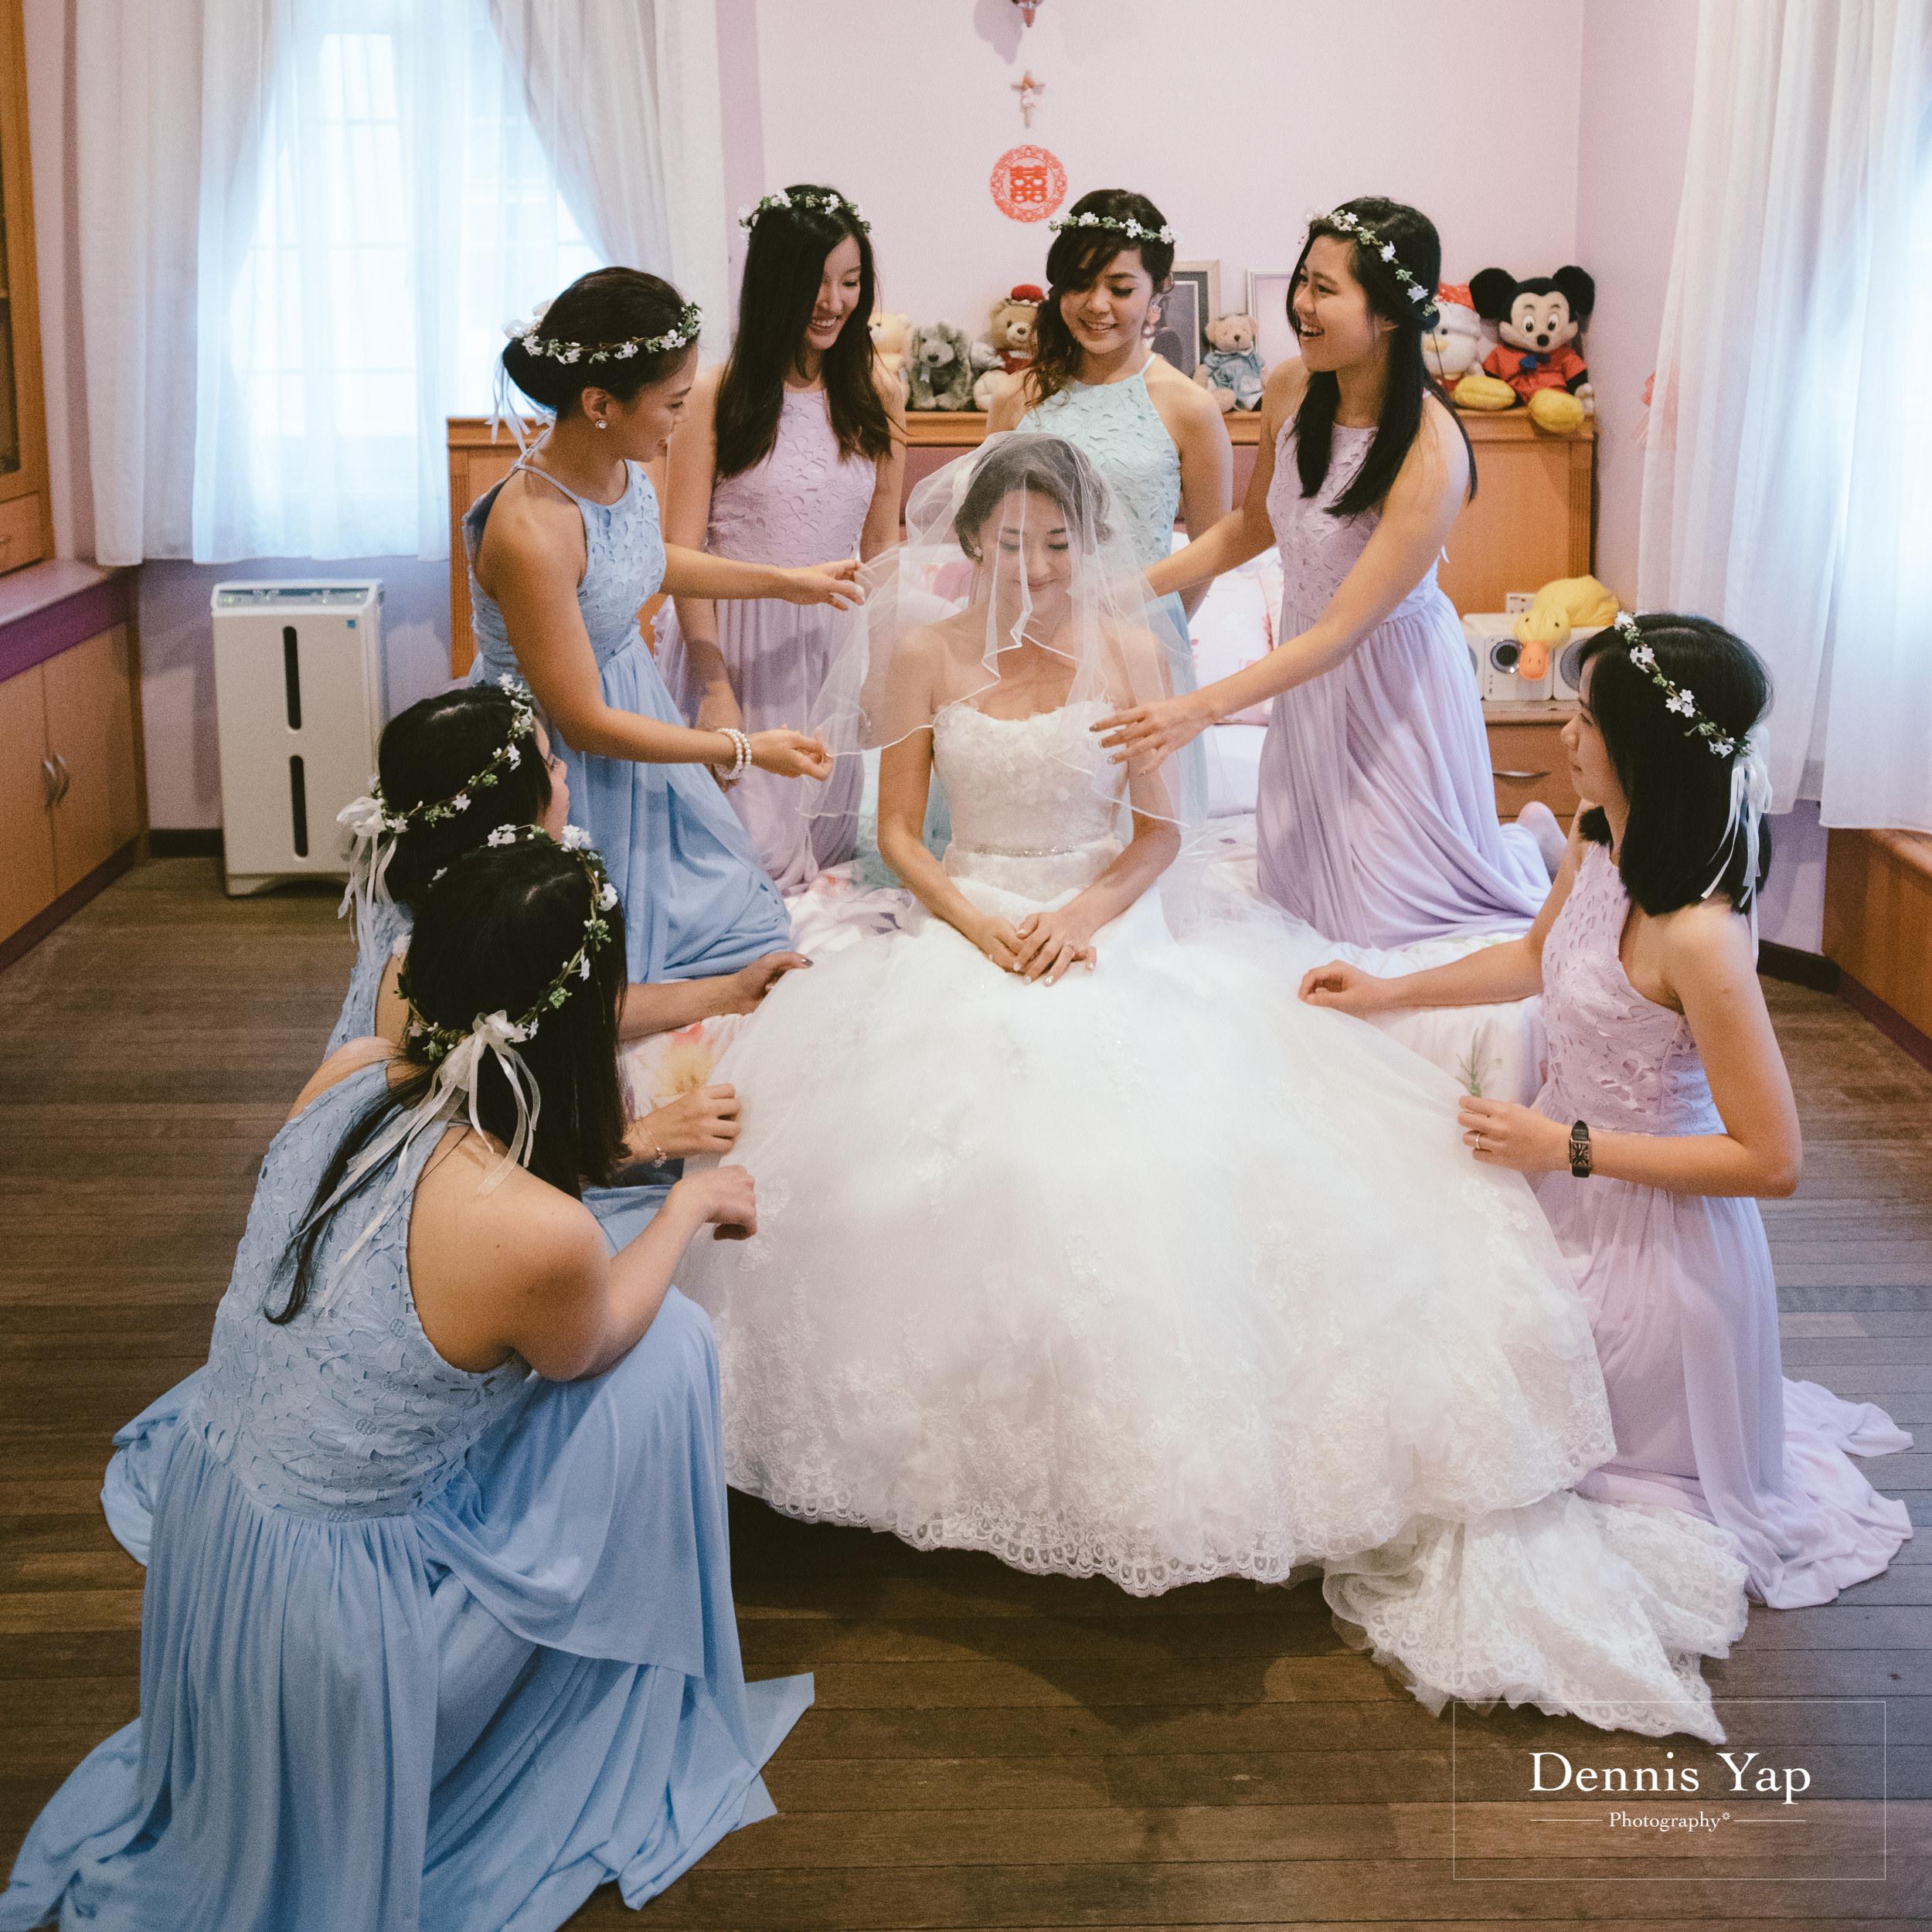 jamie hann wedding day gate crash garden wedding dennis yap photography traditional chinese tea ceremony-7.jpg